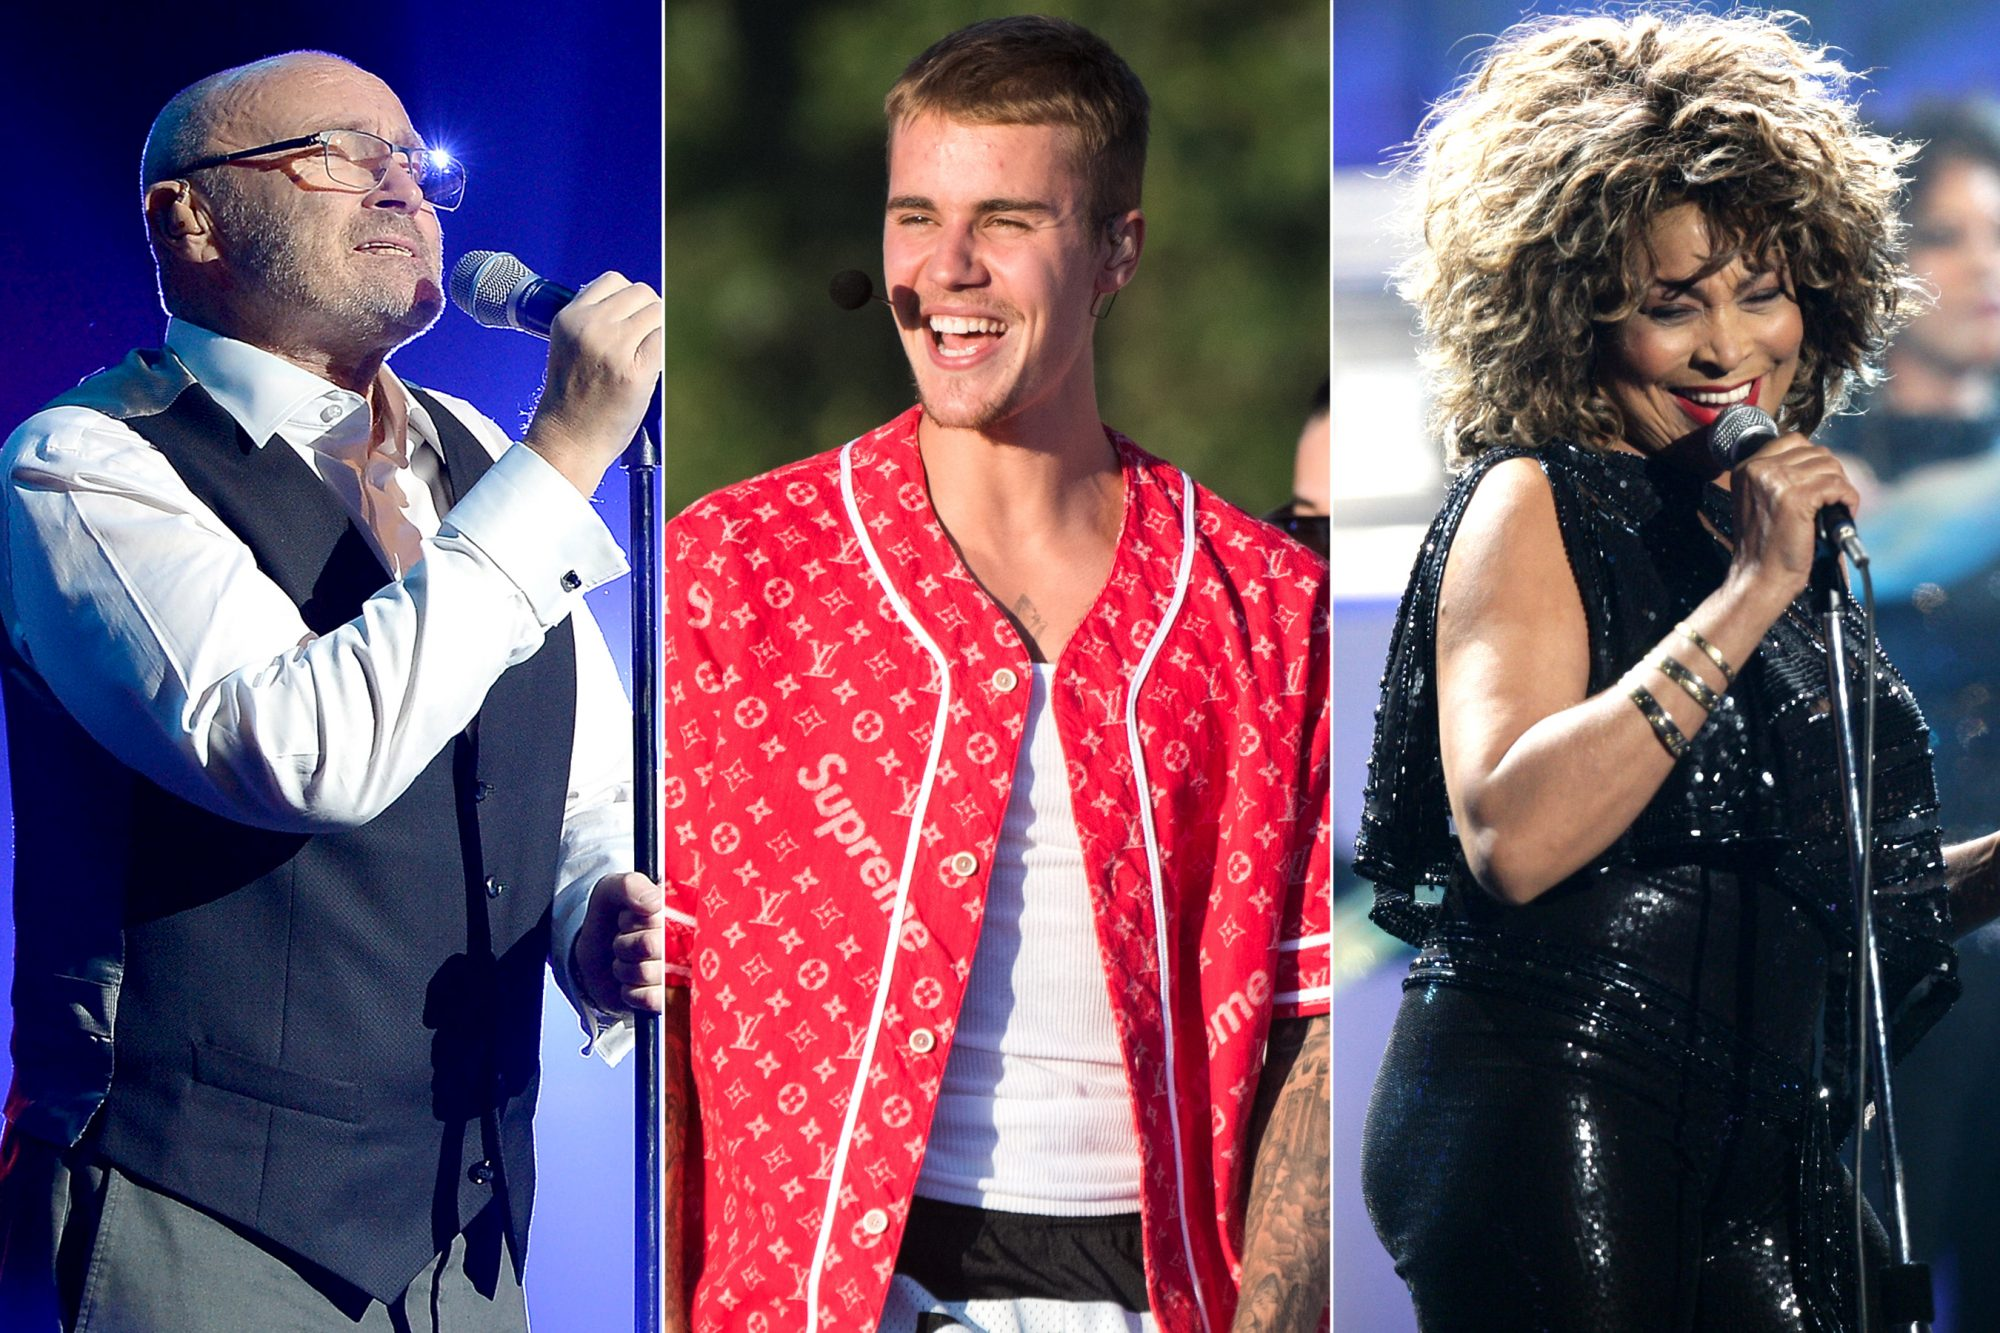 Phil-Collins-Justin-Bieber-Tina-Turner